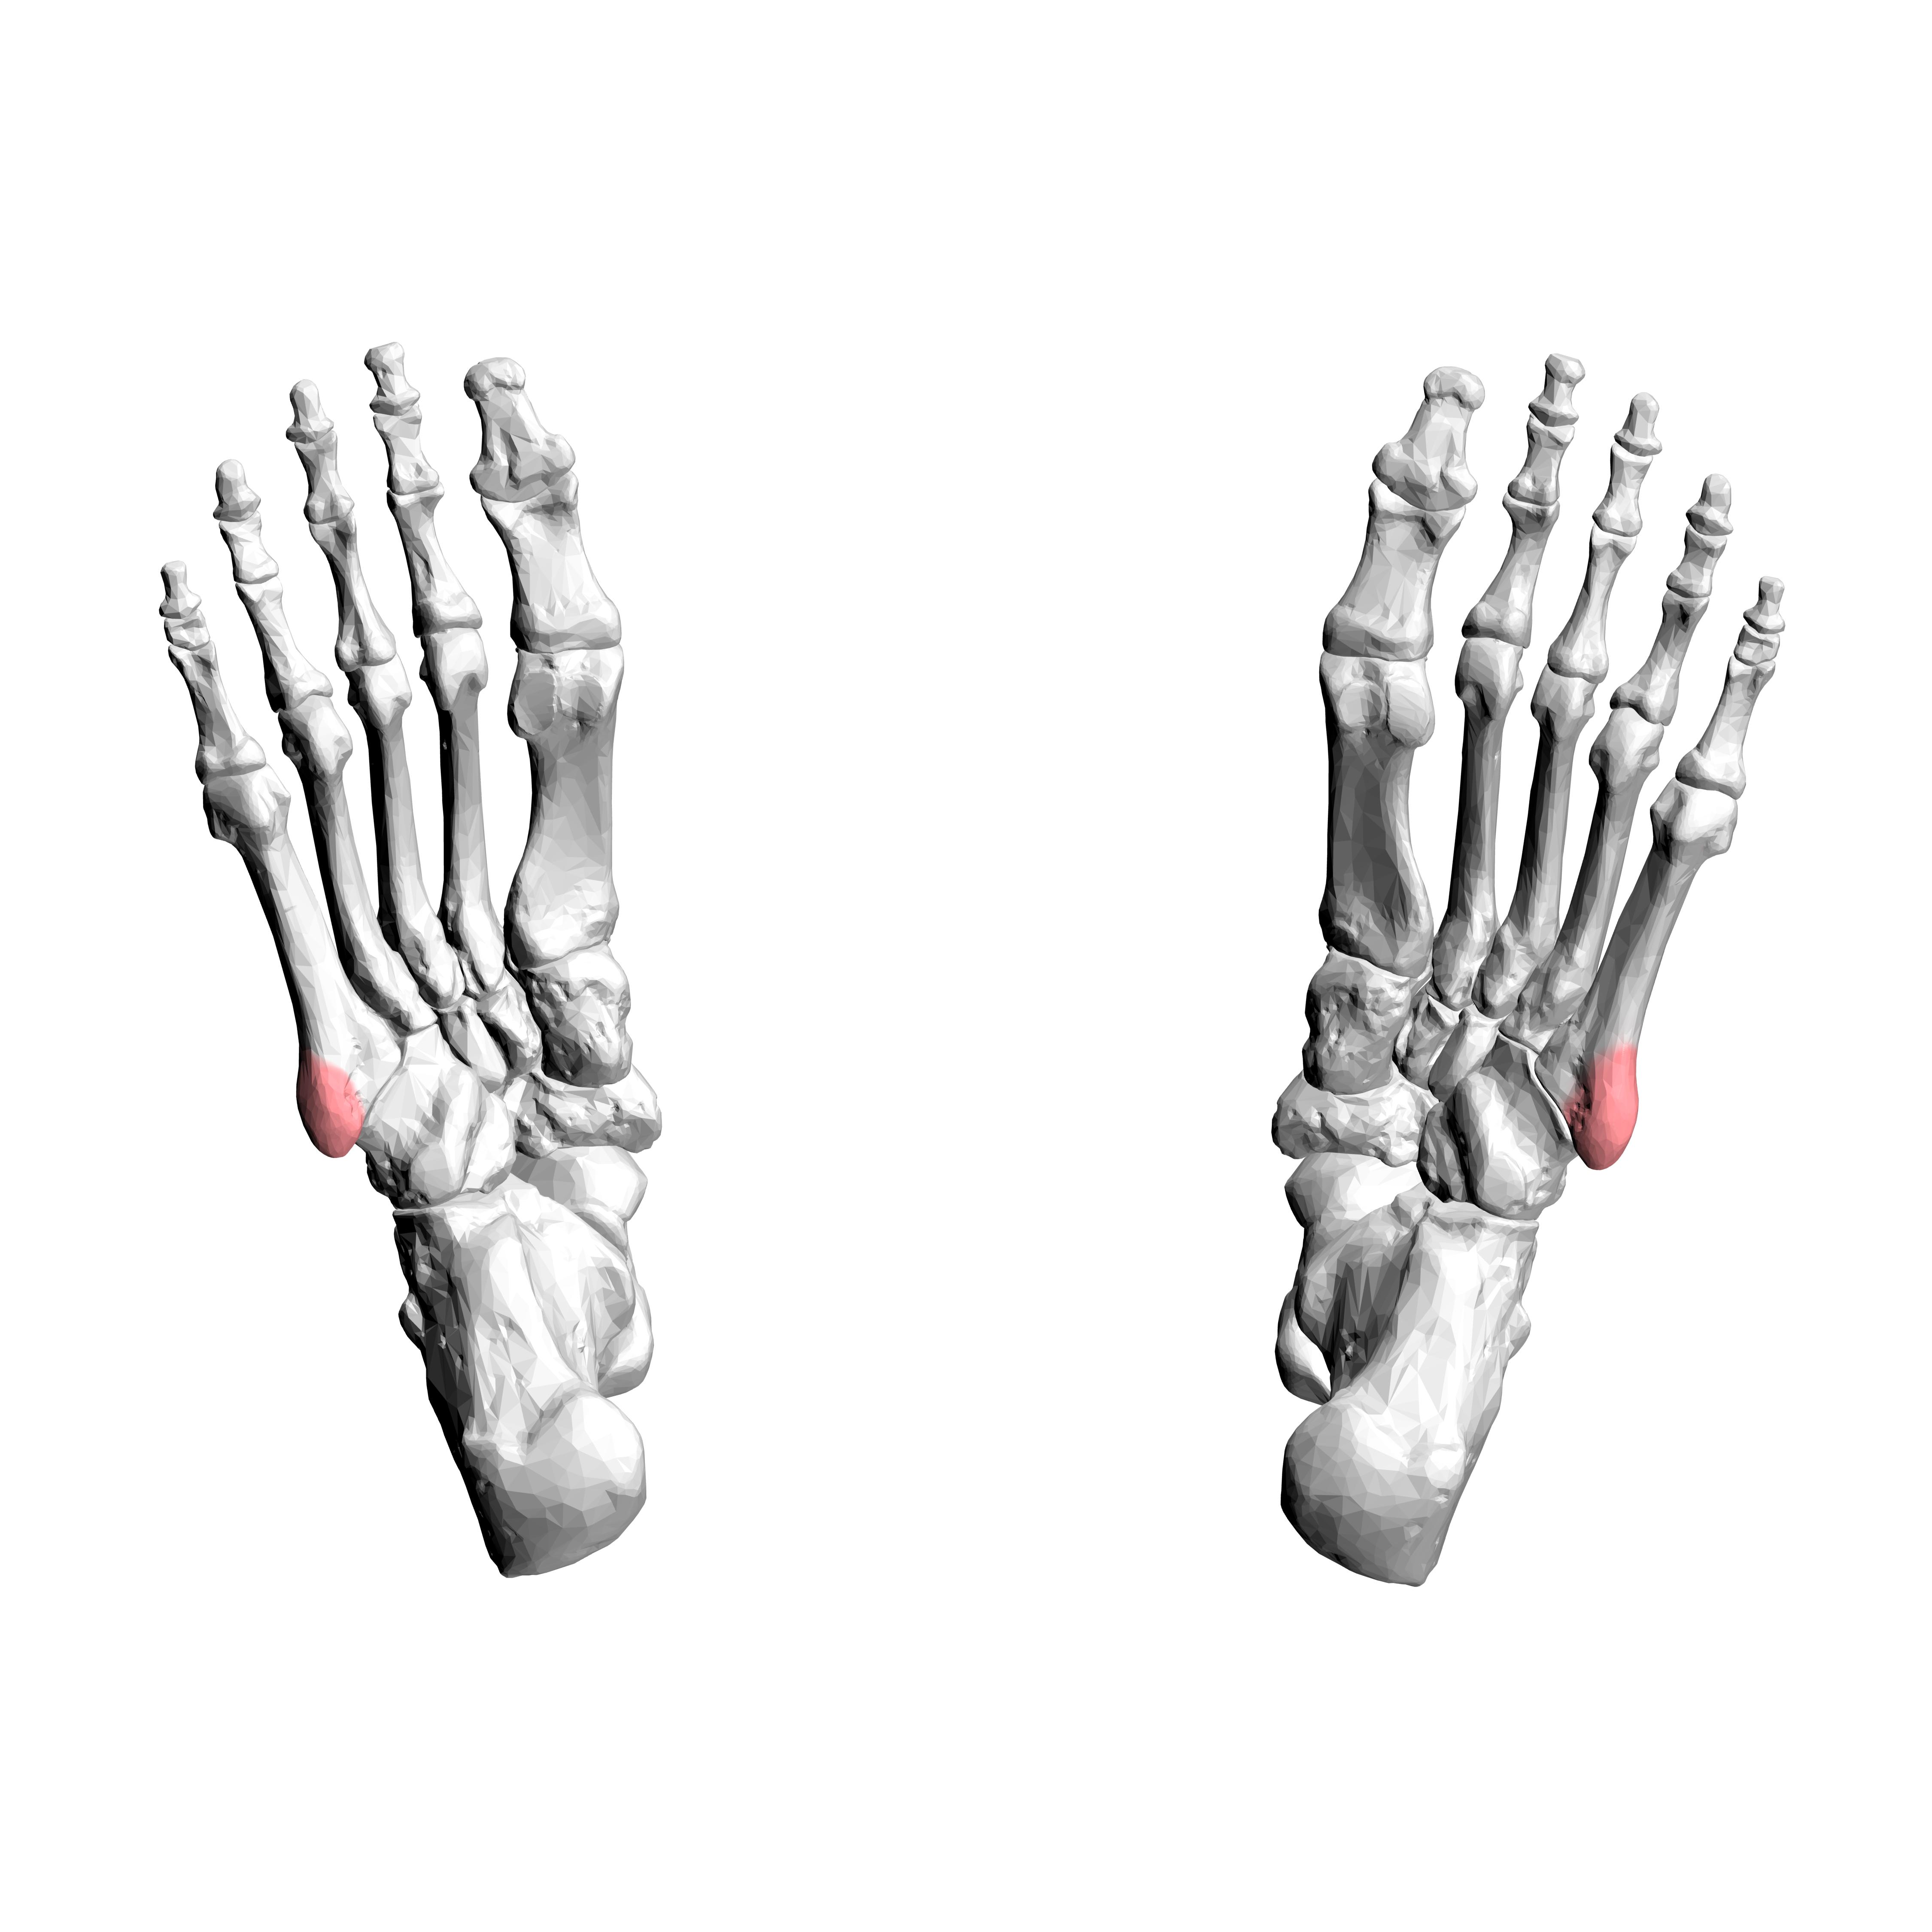 3 5 M To Feet File Tuberosity Of Fifth Metatarsal Bone 03 Inferior View